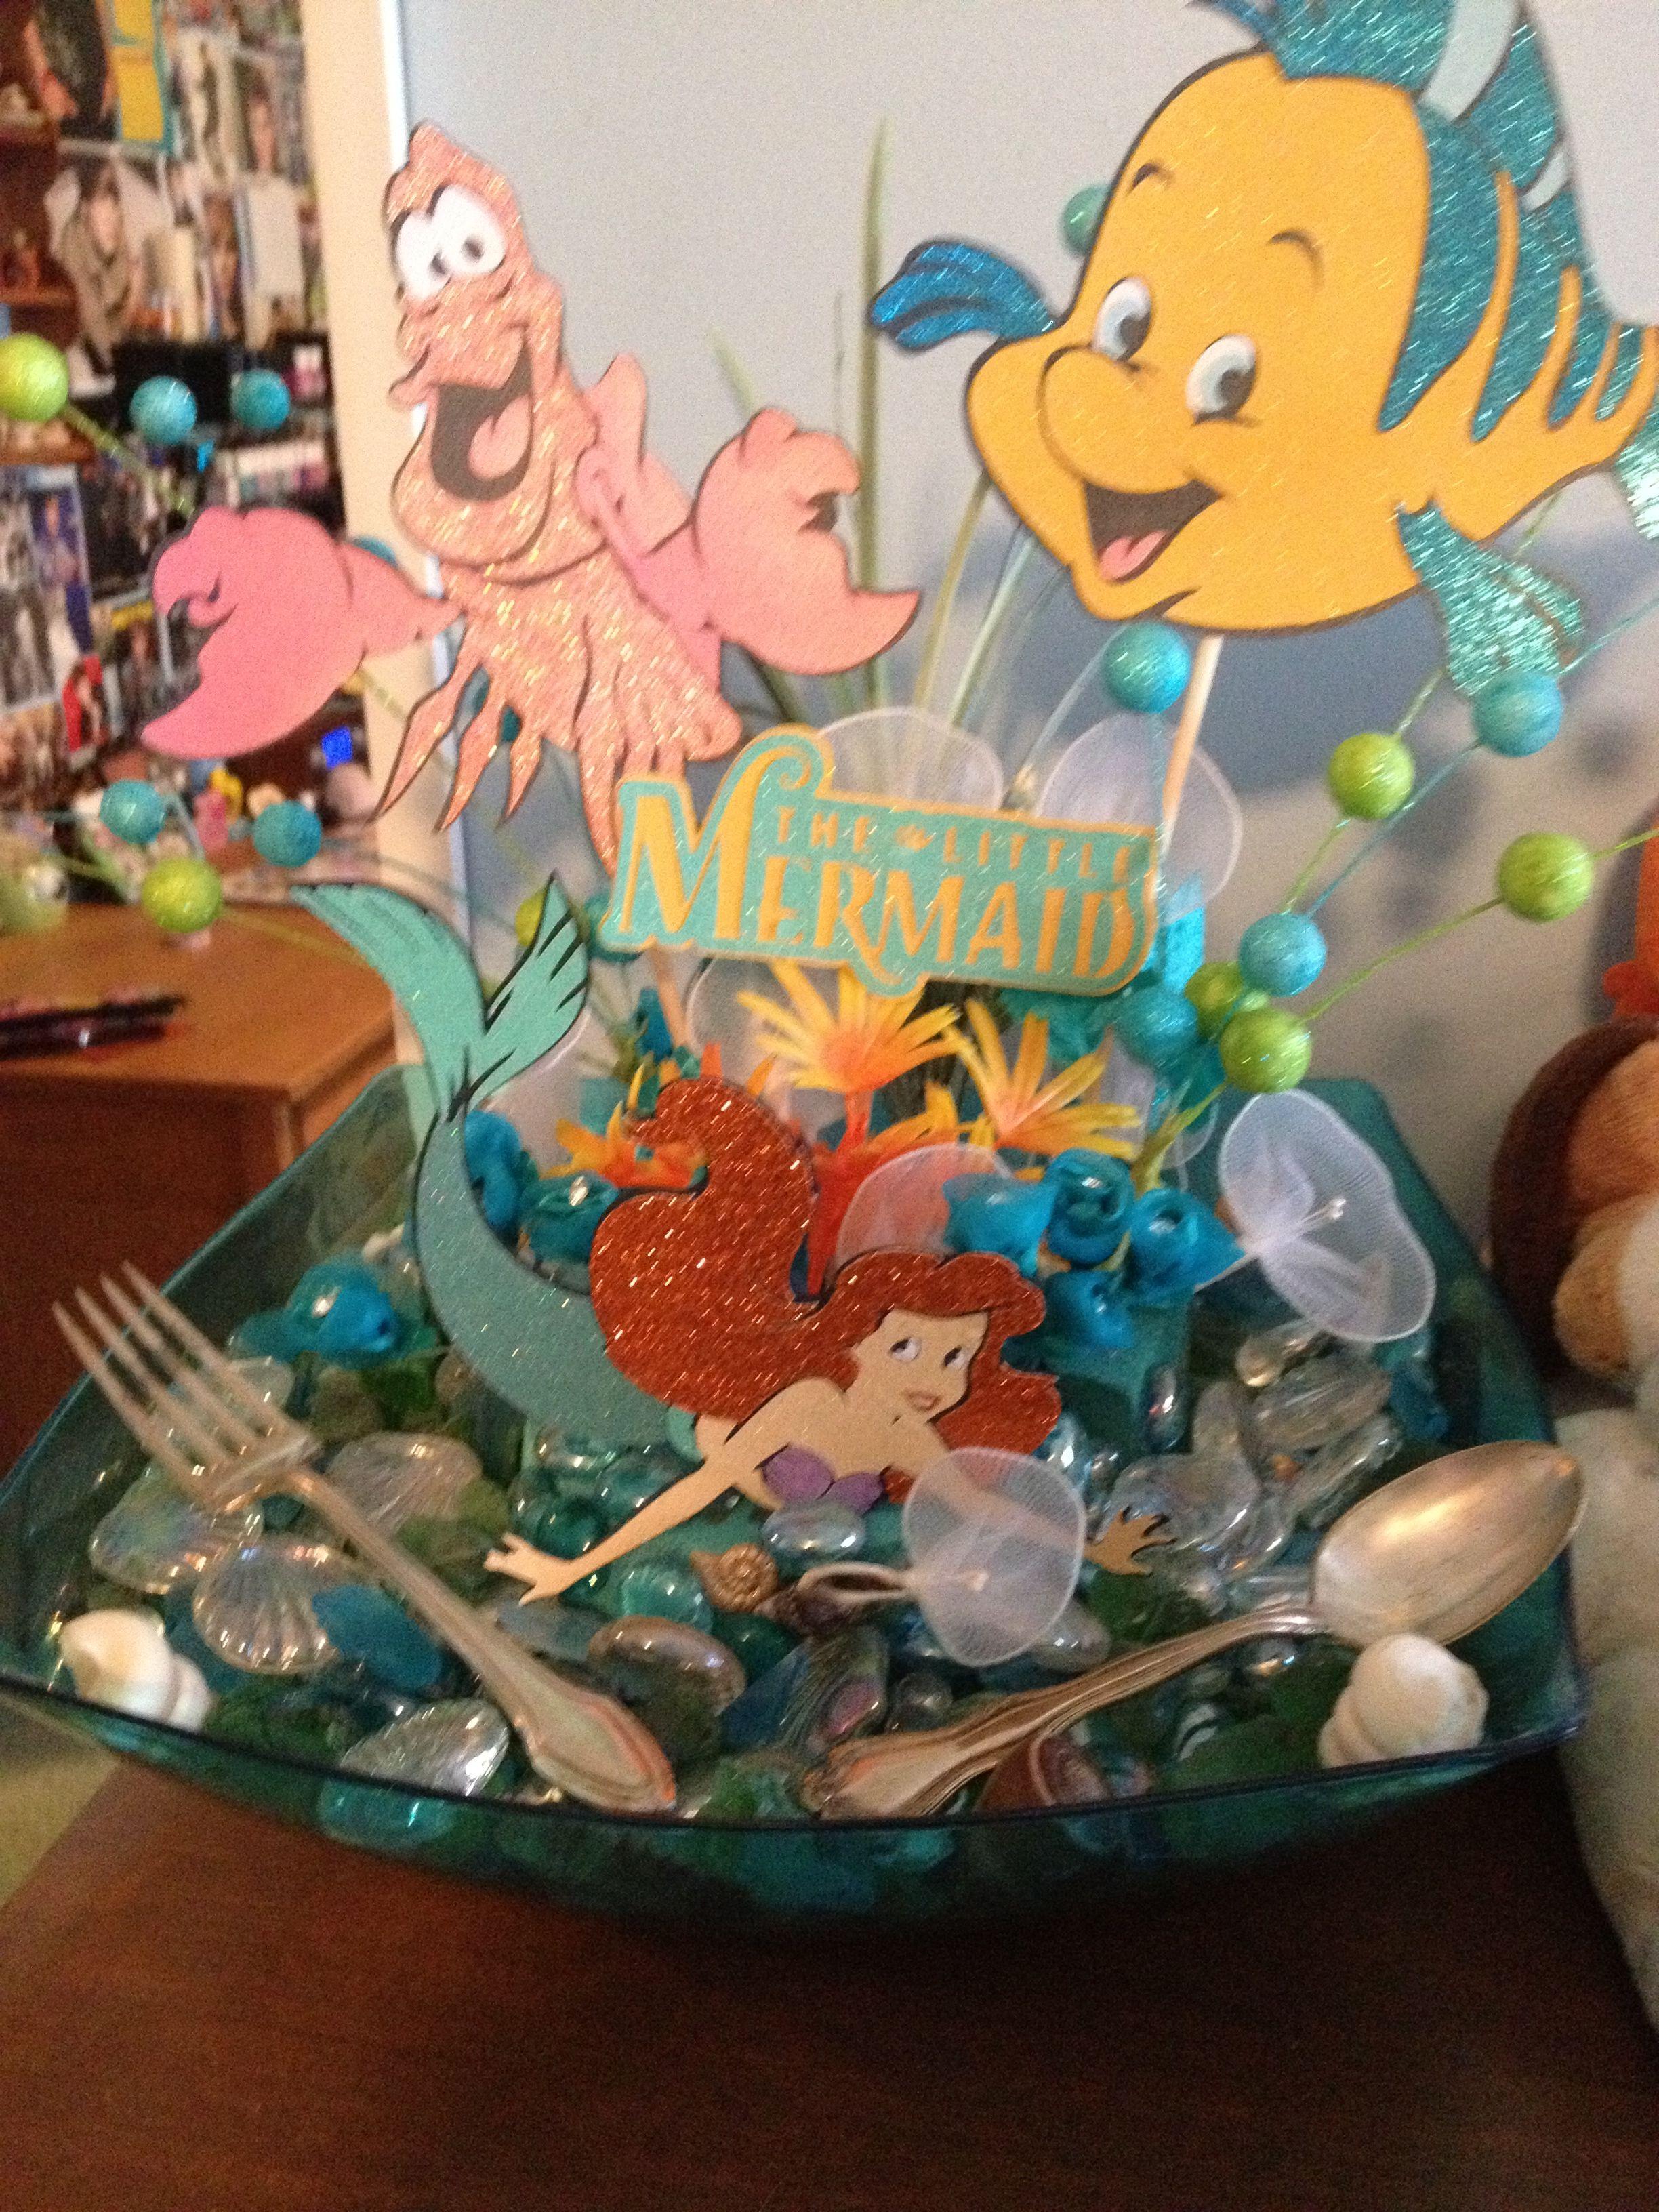 DIY the little mermaid centerpiece | Little mermaid ...